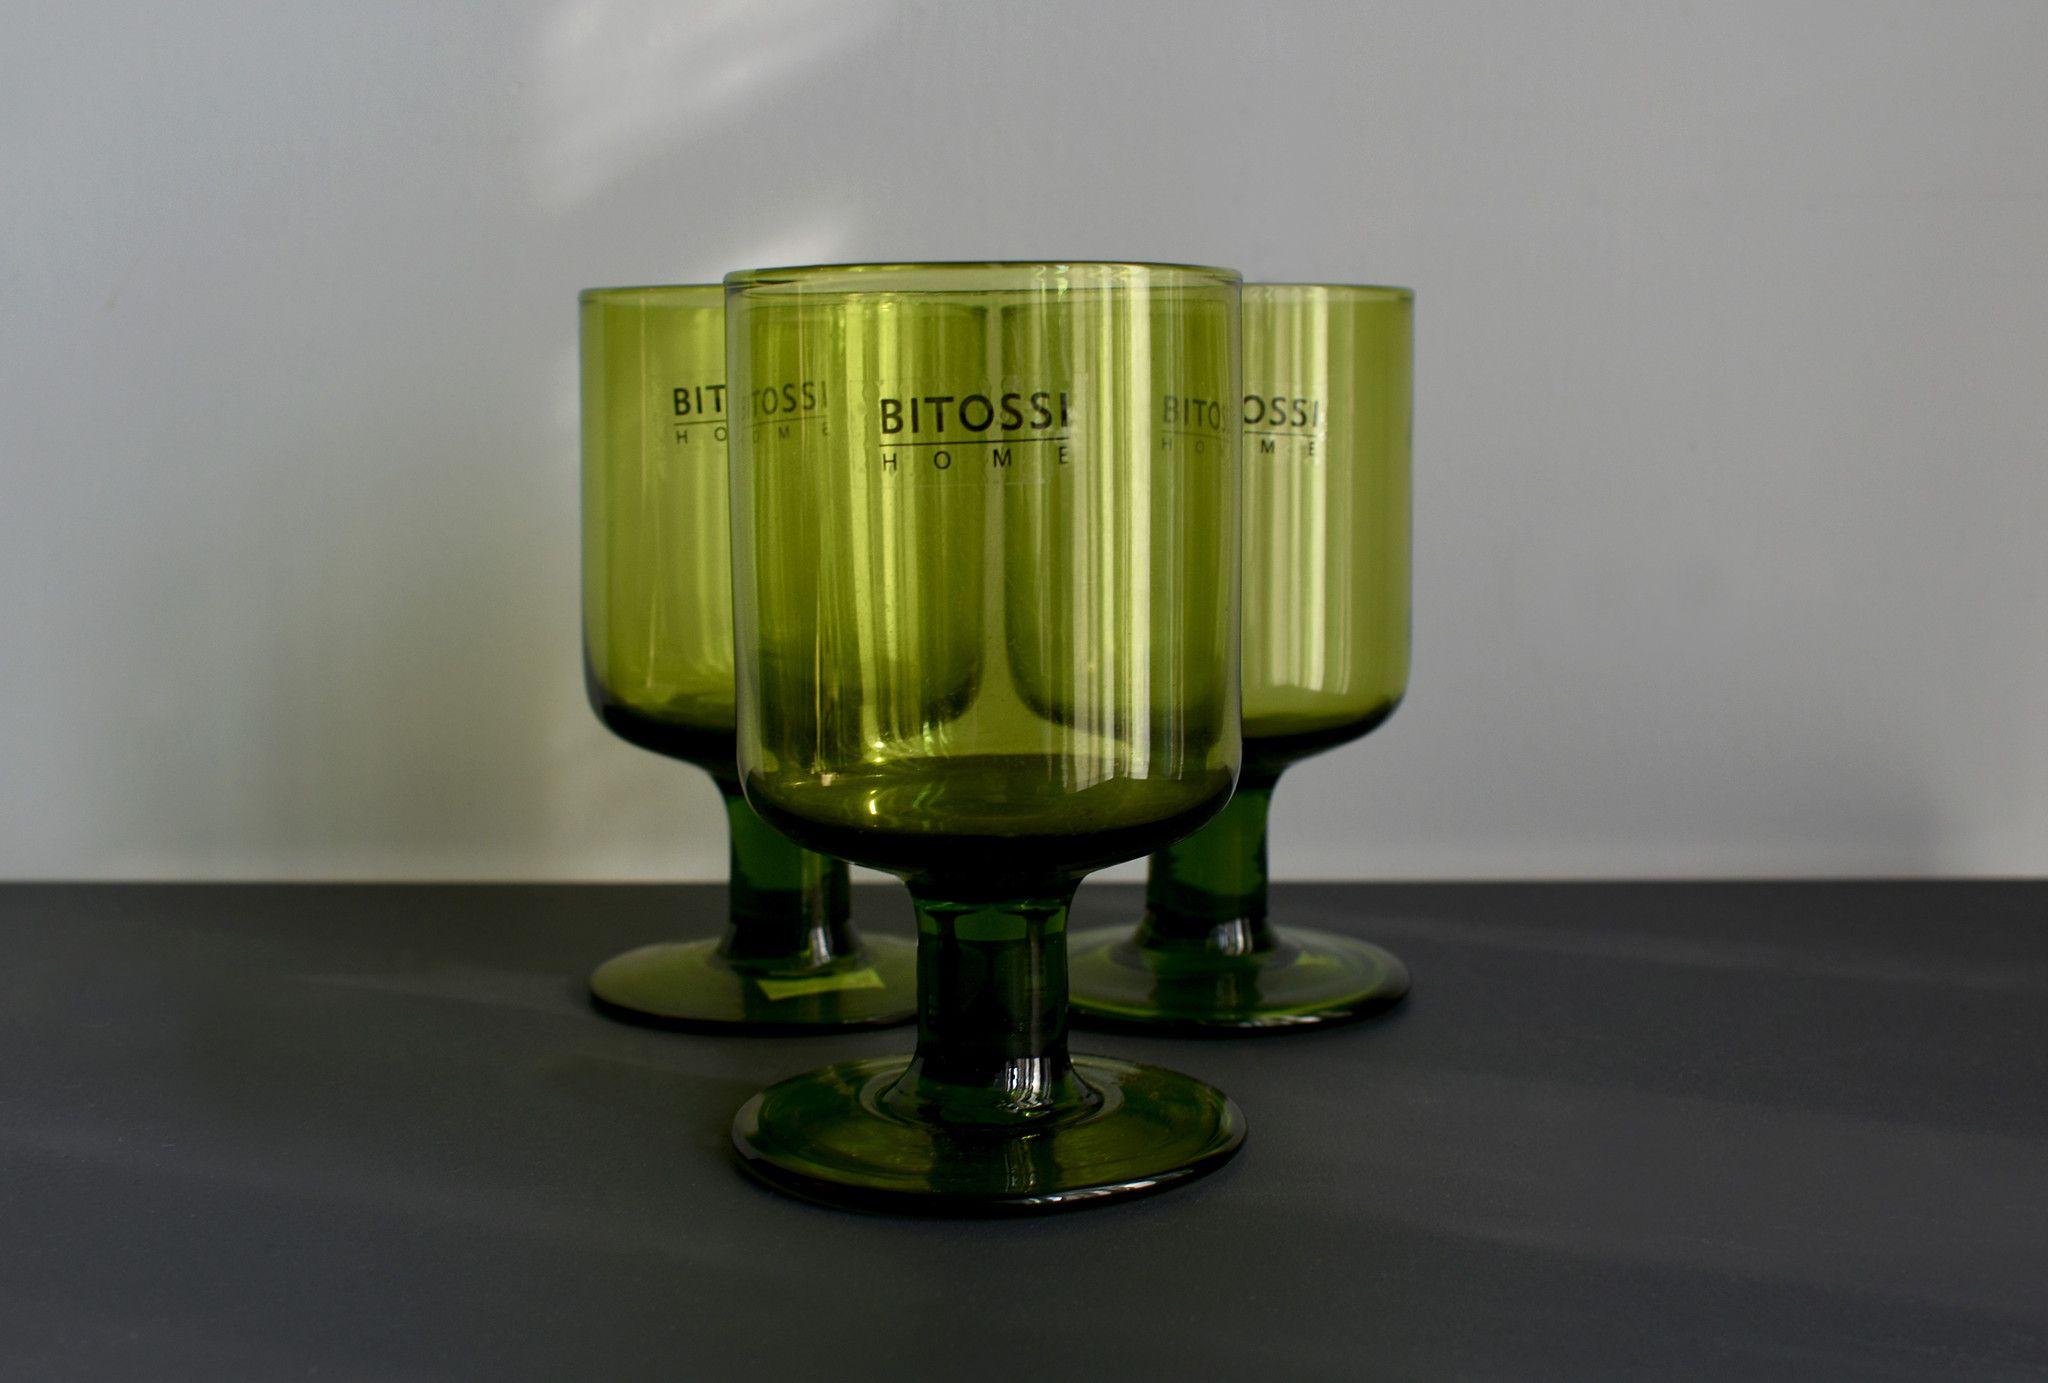 Bicchieri Venice - Bitossi